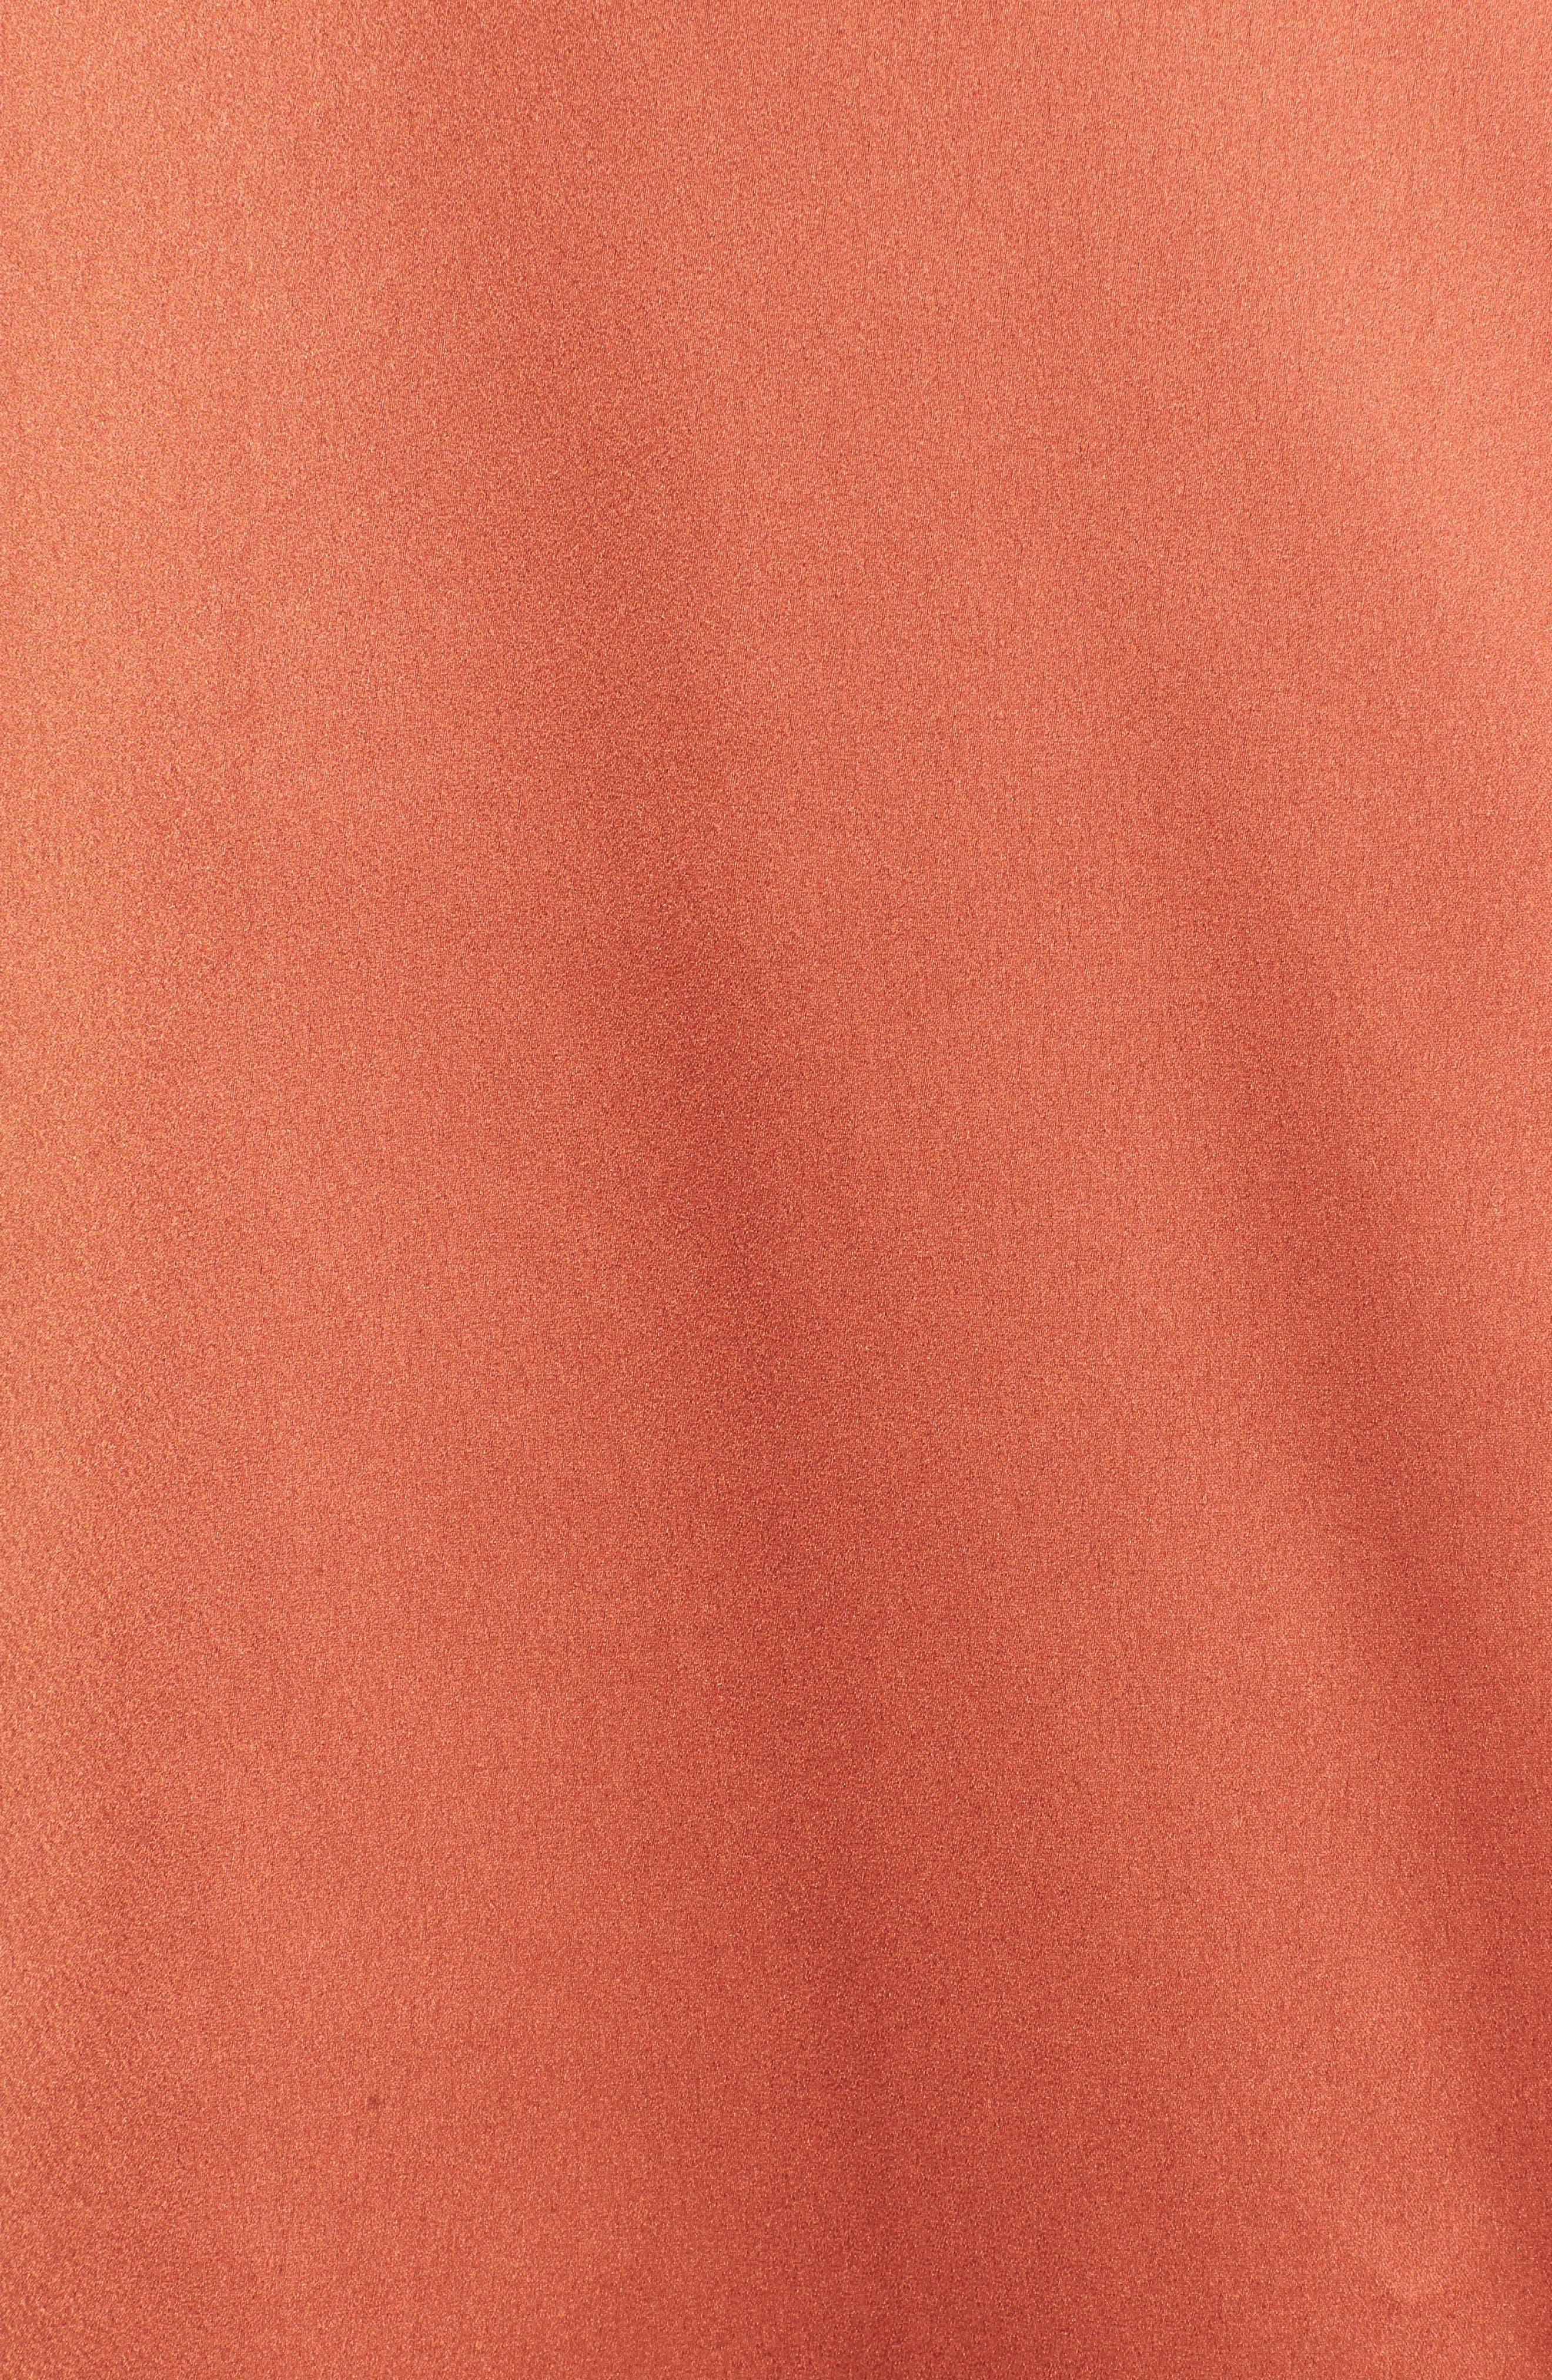 Satin Wrap Dress,                             Alternate thumbnail 5, color,                             201